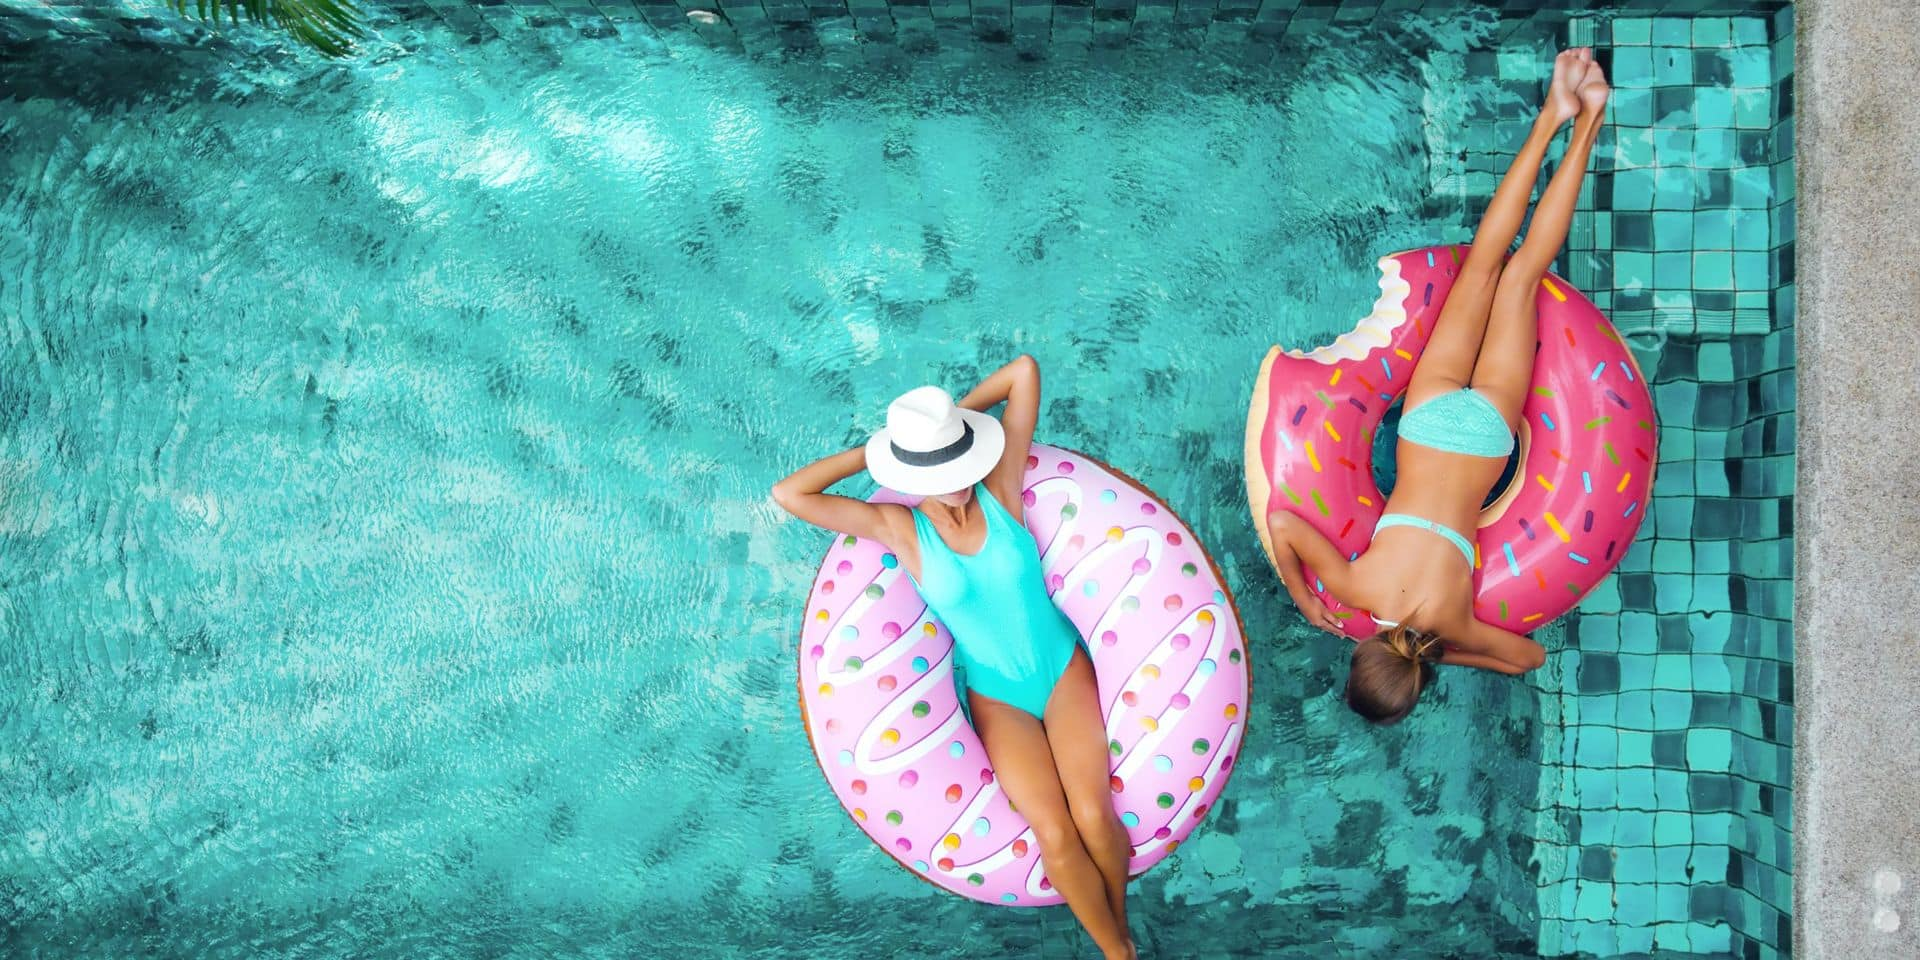 S'offrir sa piscine sera tendance en 2020